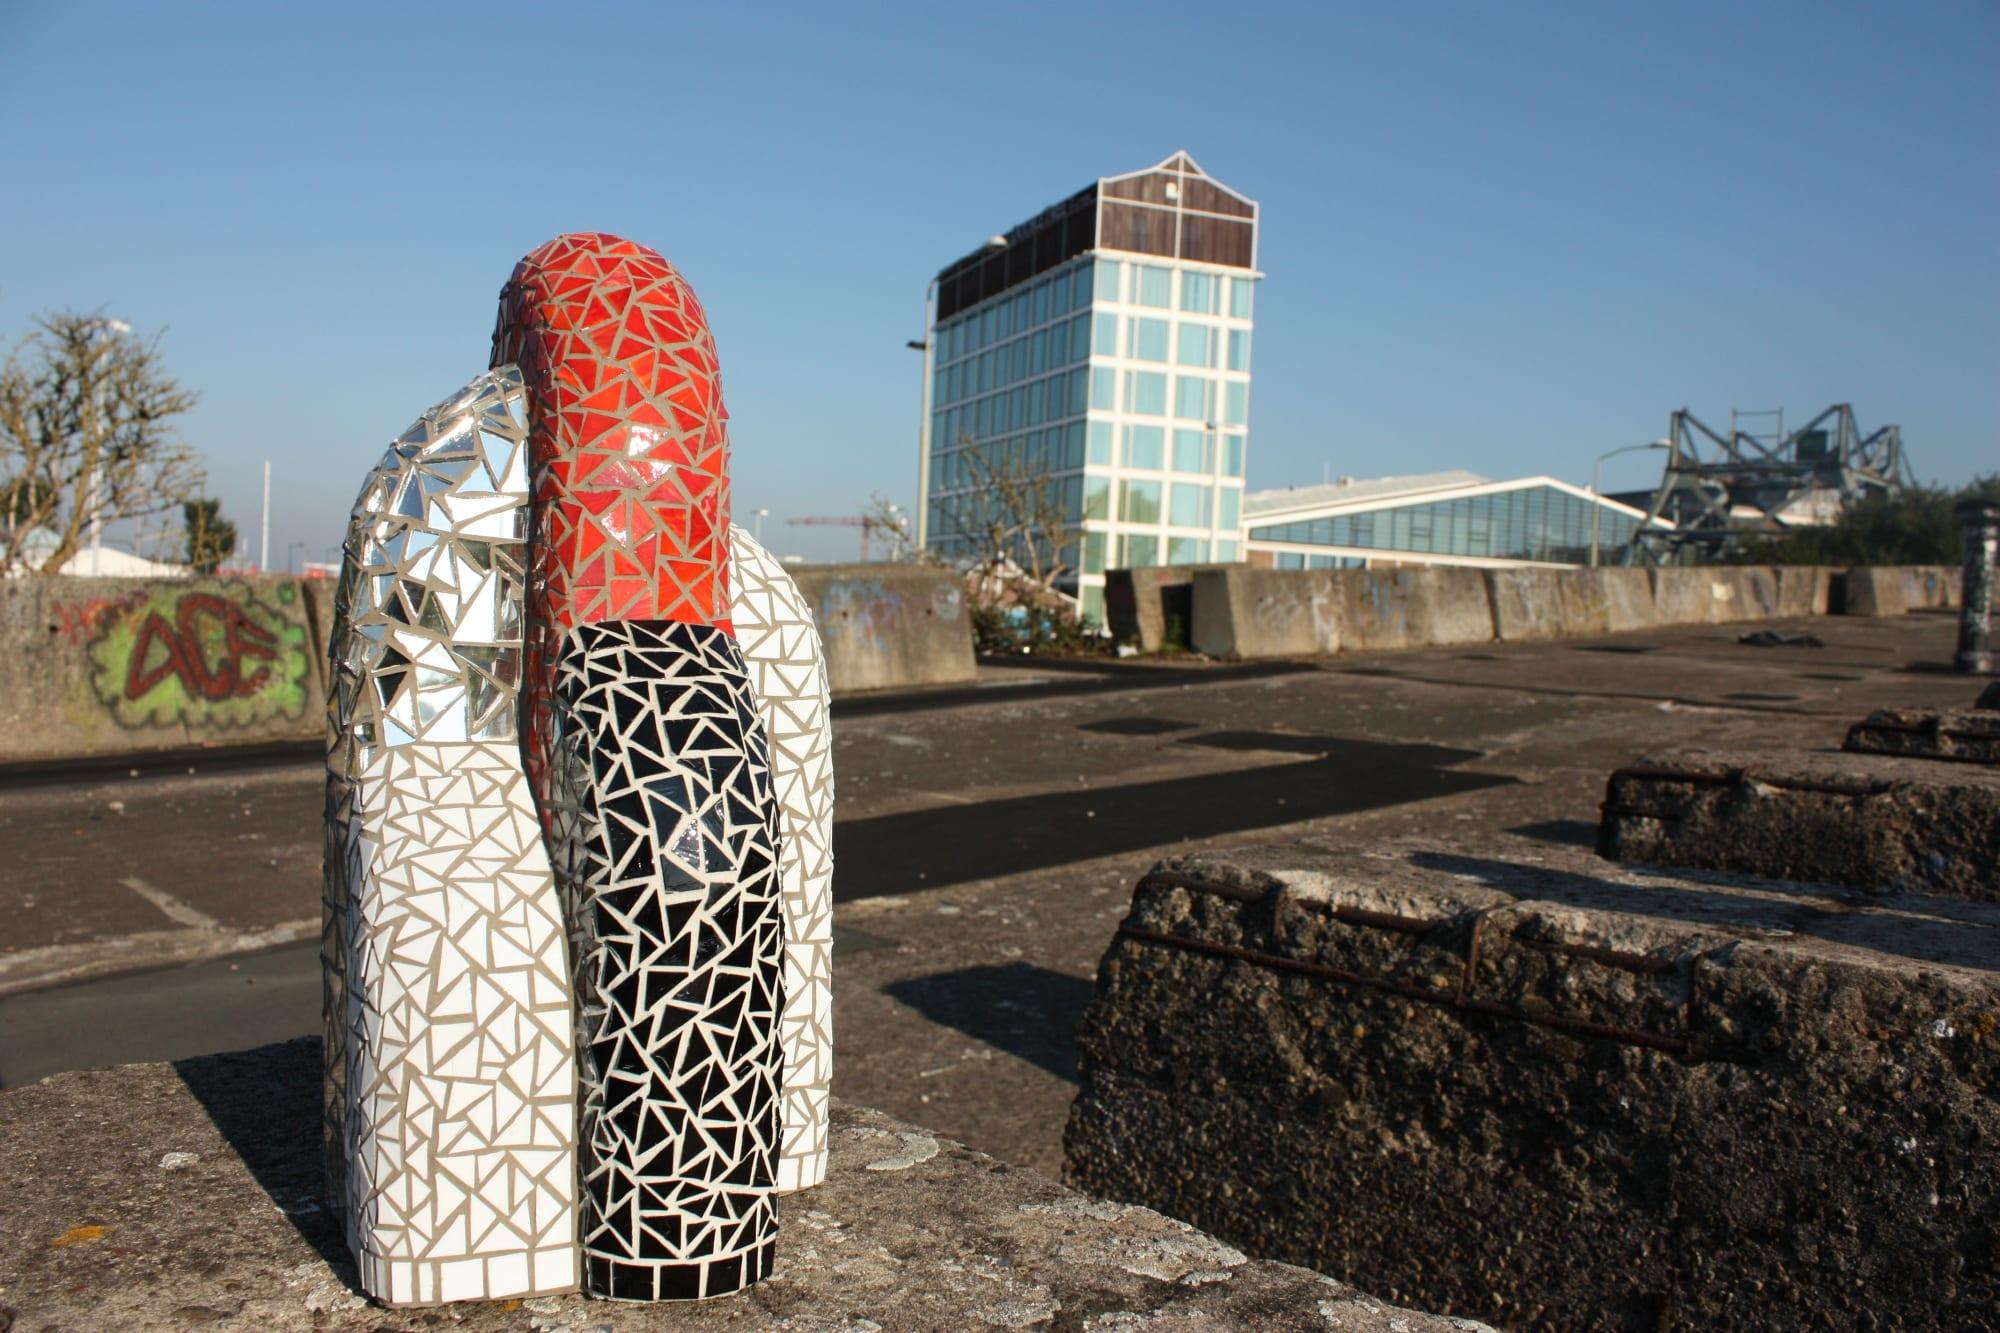 Sculptures by Peter Vial seen at Amsterdam-Zuidoost, Amsterdam - 'REFLECTIONS'